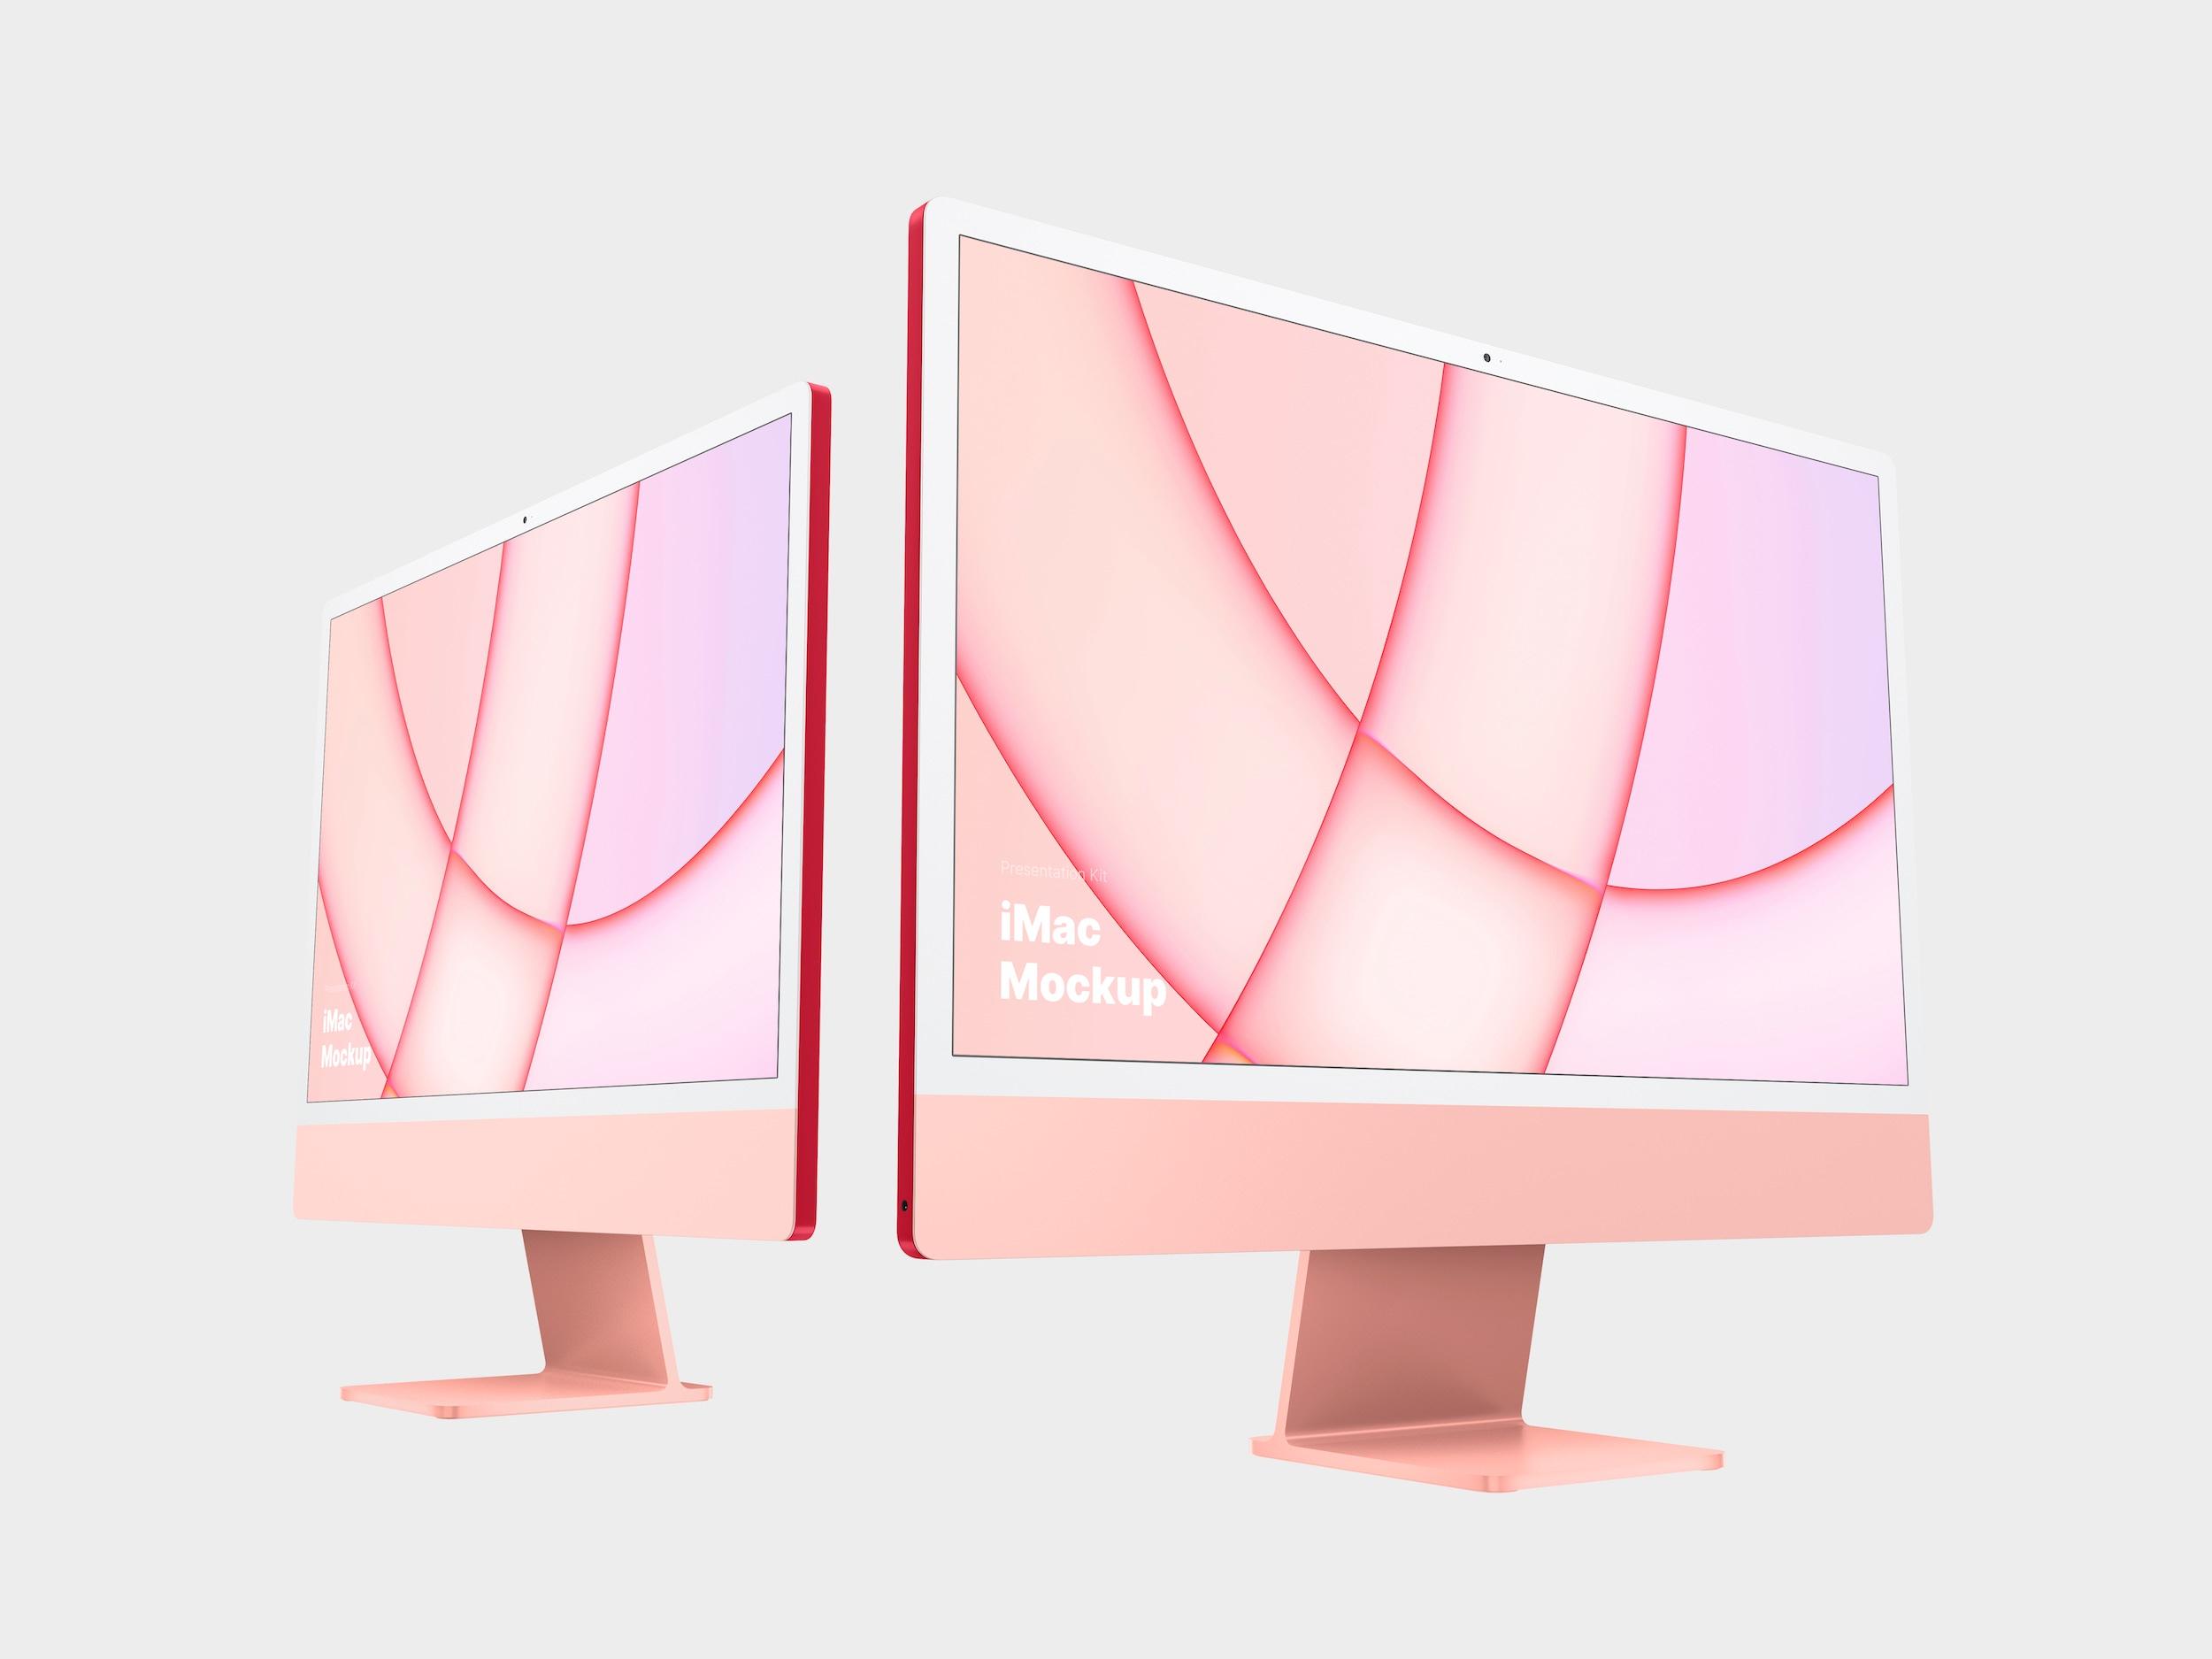 Pink iMac Mockup